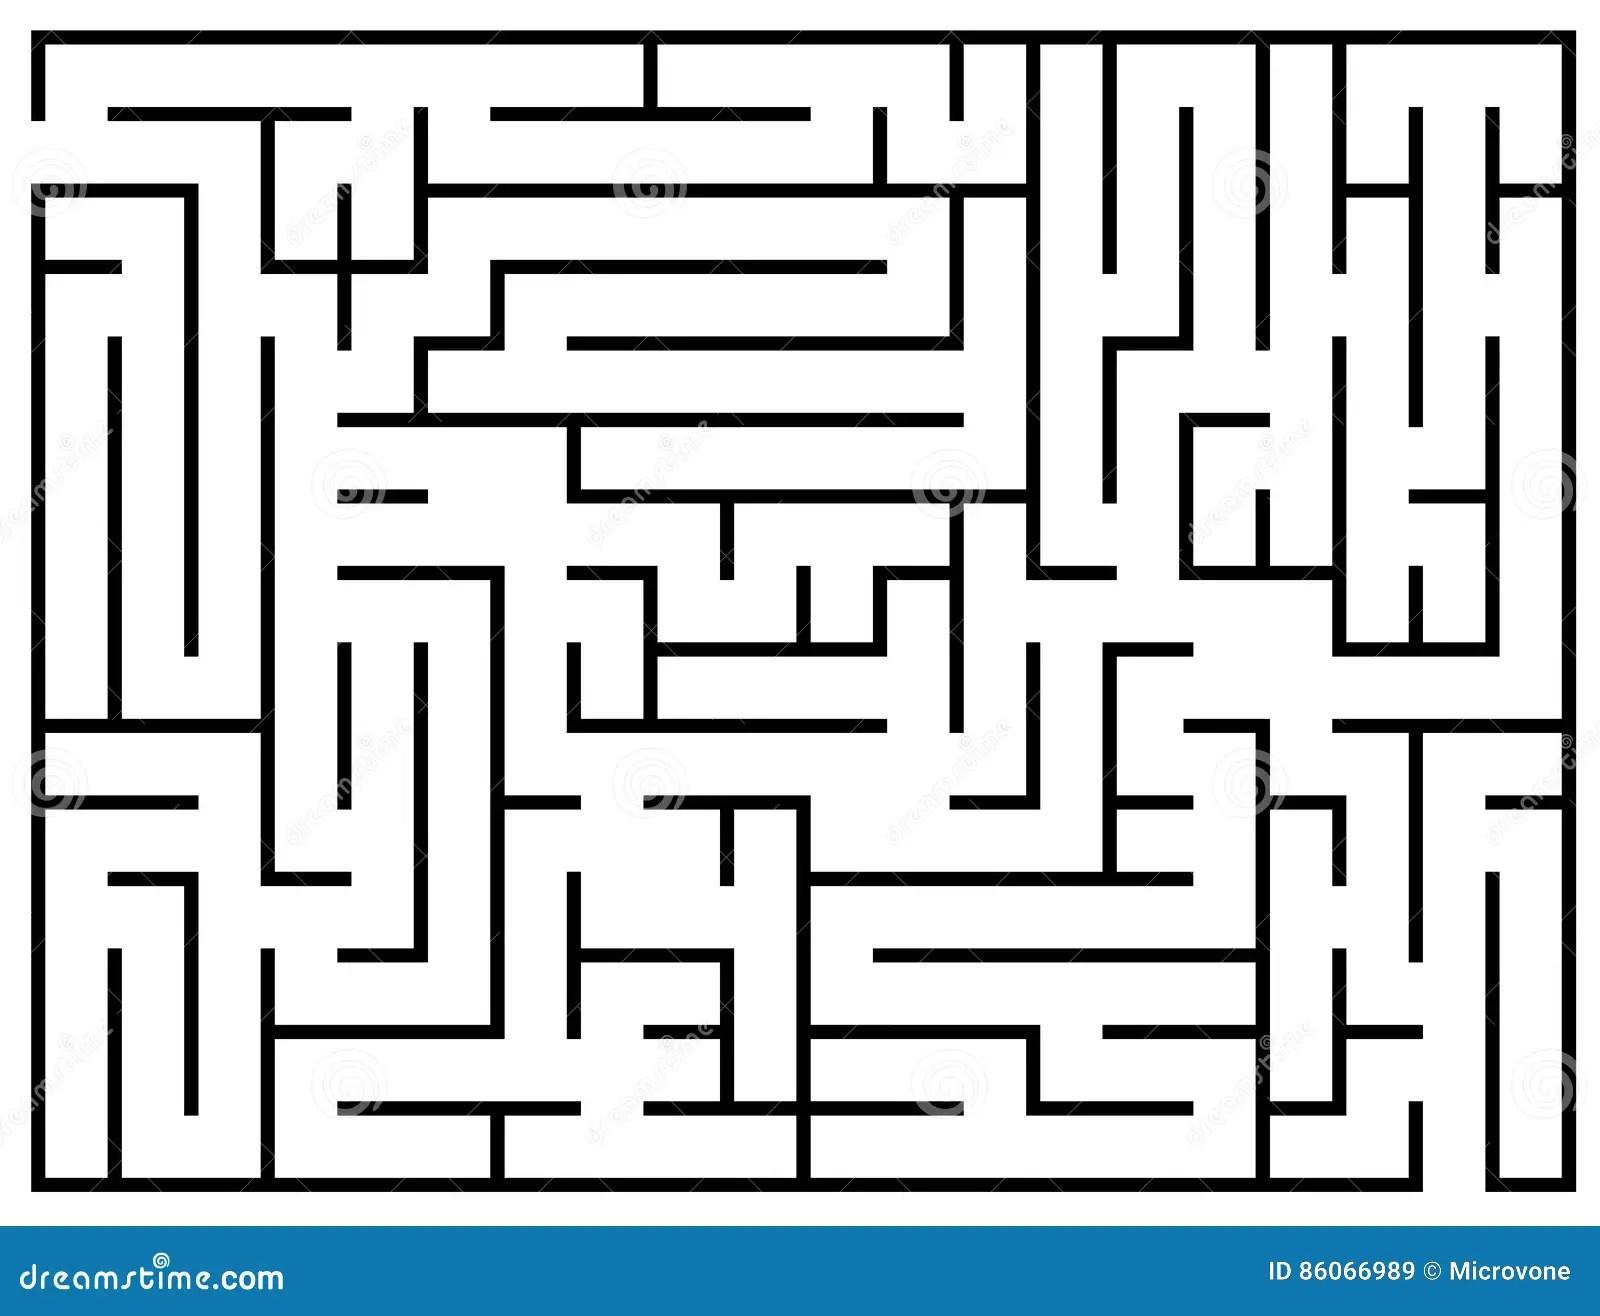 Kids Riddle Maze Puzzle Labyrinth Vector Illustration